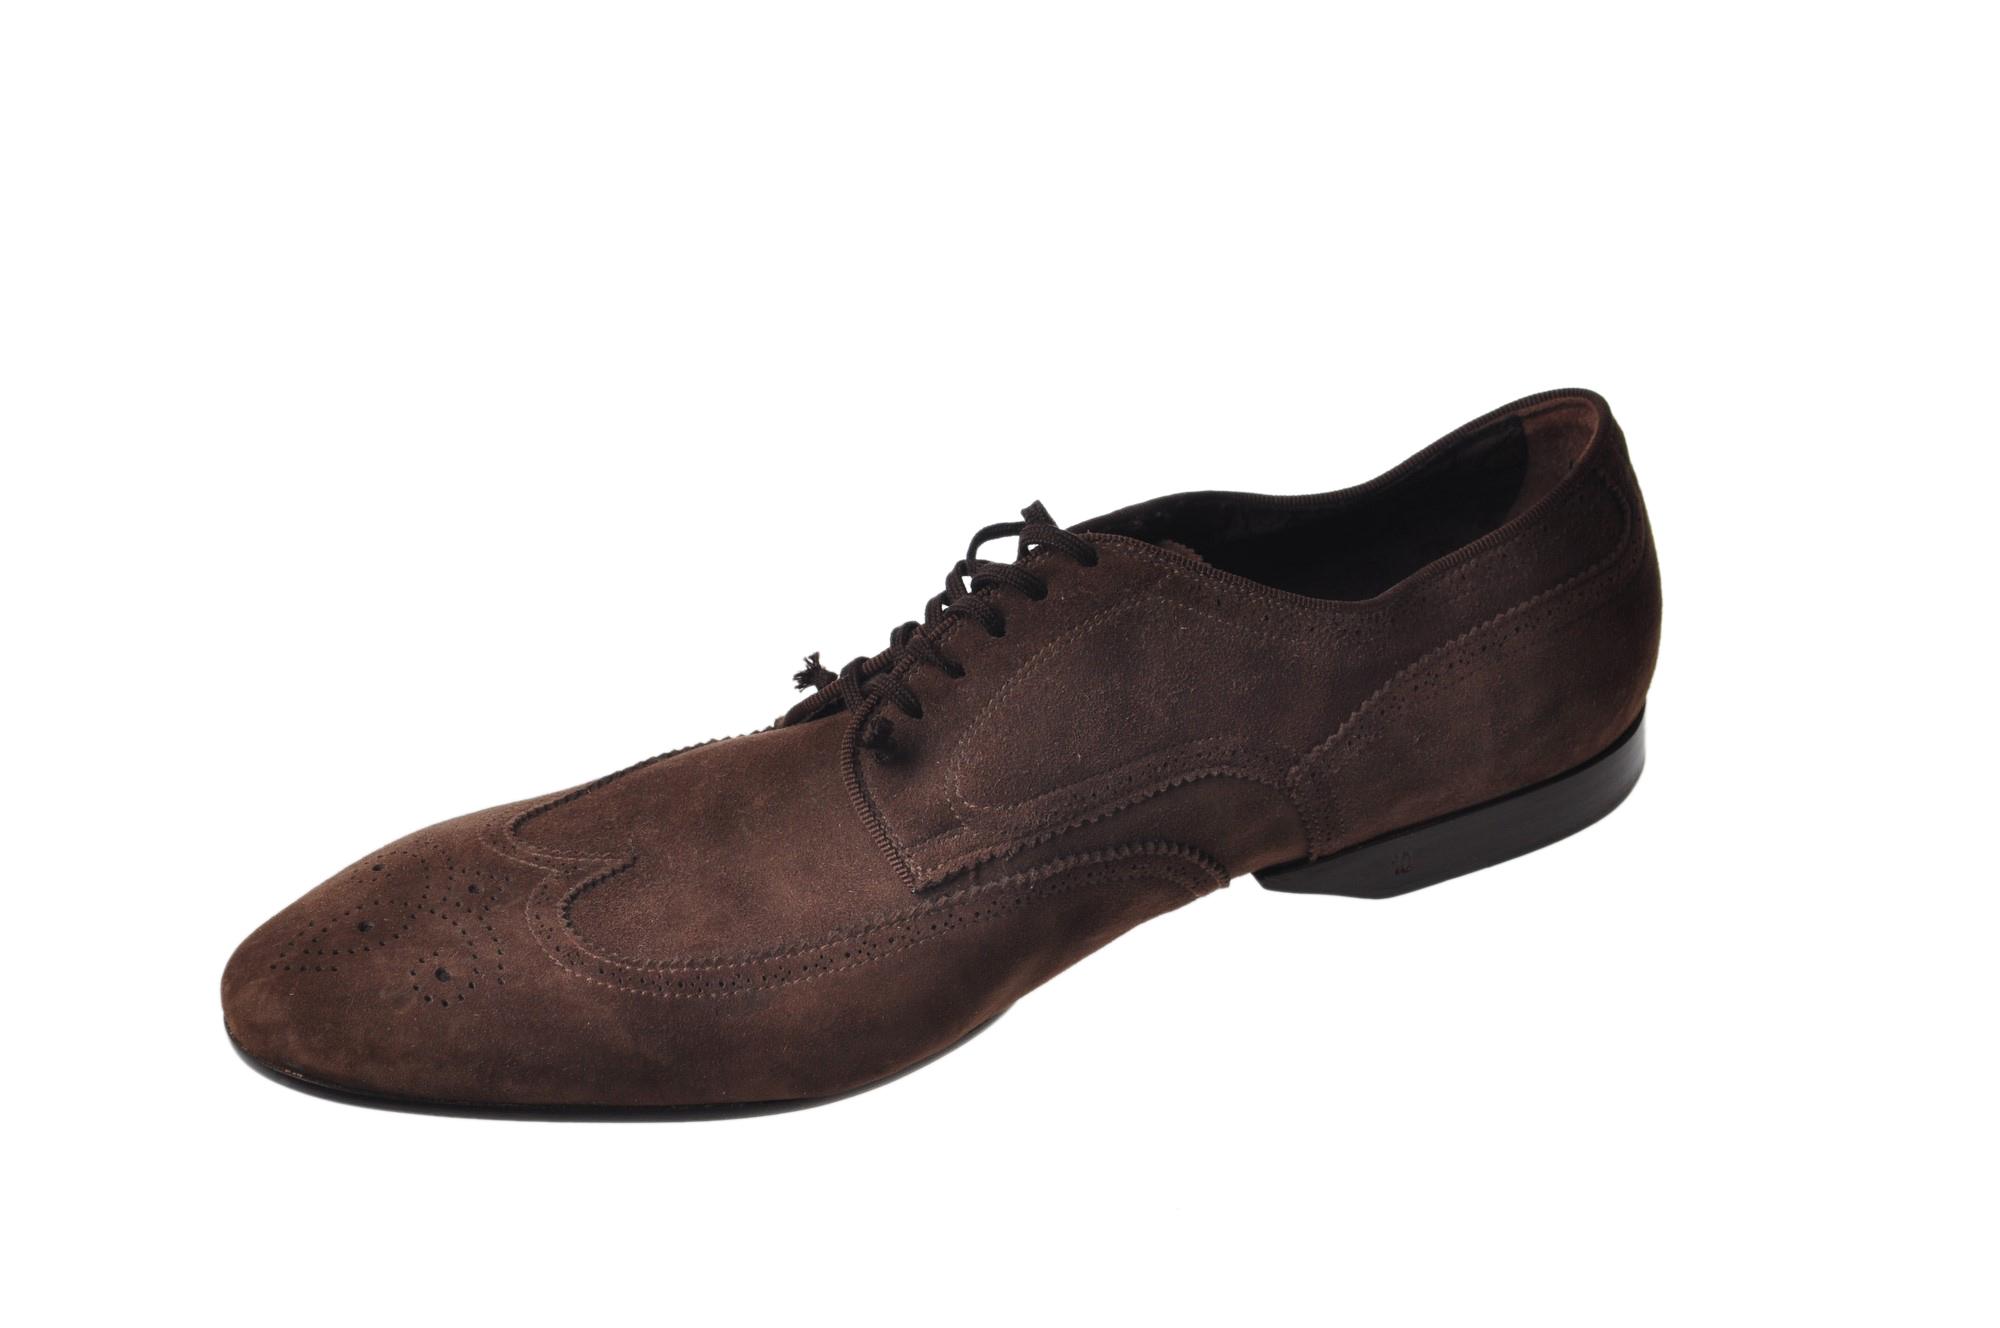 premium selection 24656 91f60 Raparo Lace-up Shoes Stringate   bemymood